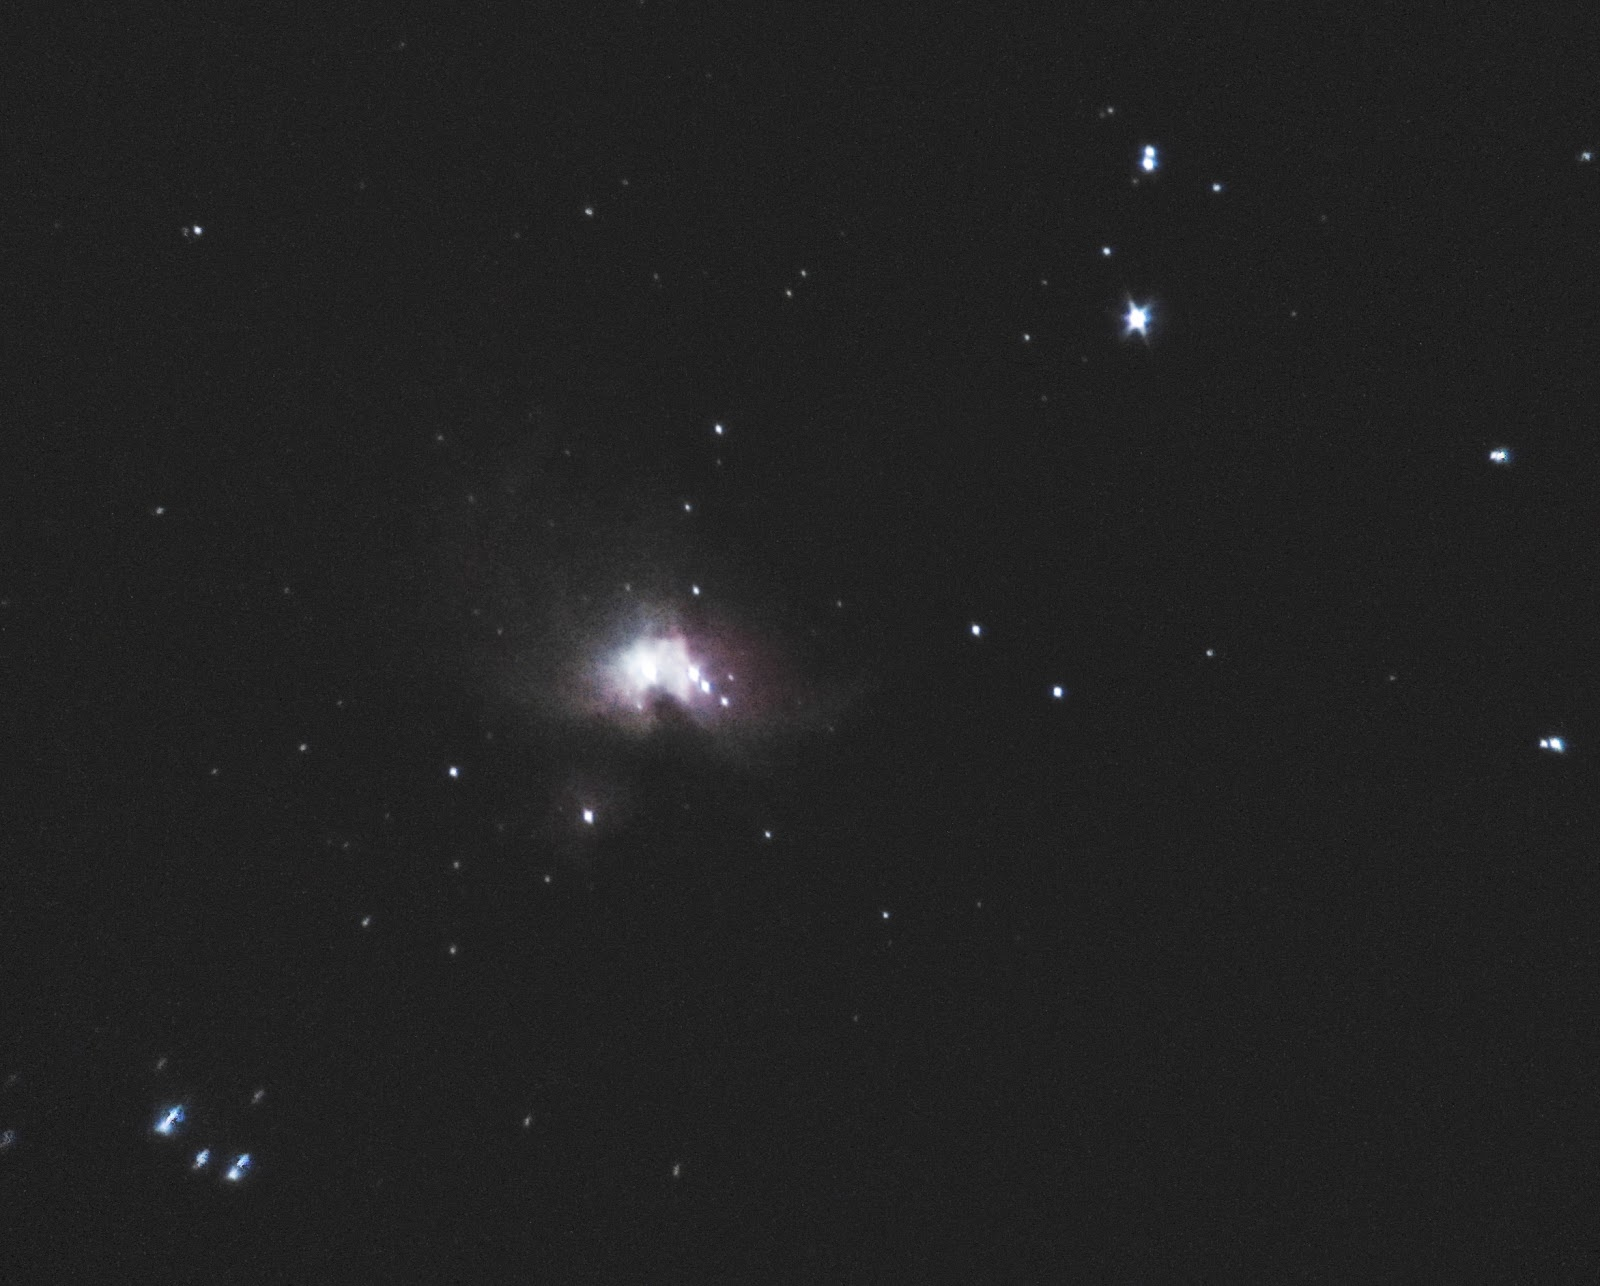 nebula orion telescope - photo #23